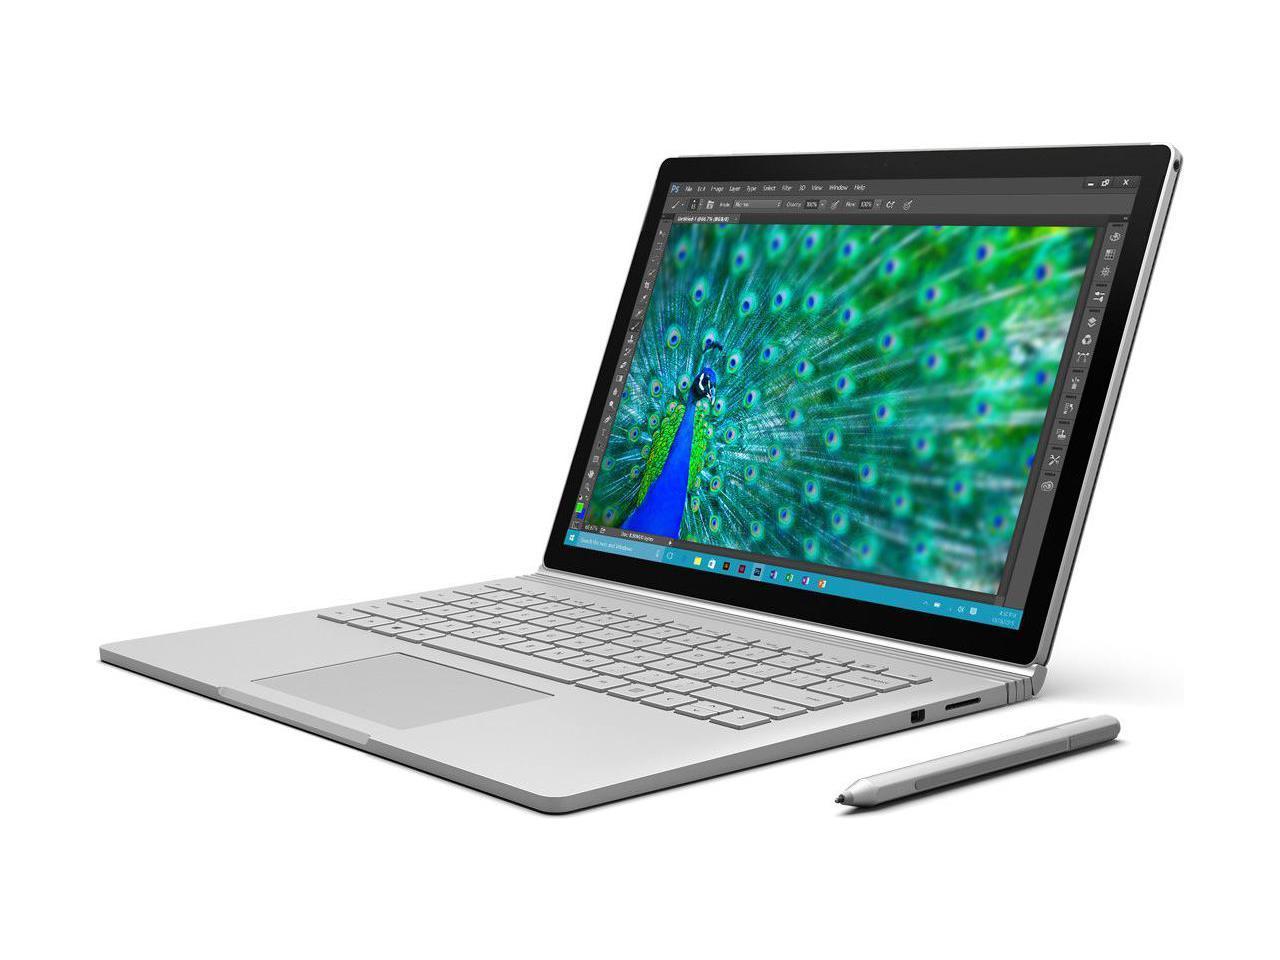 Microsoft Surface Book i7 6th Gen 8 GB Memory 256 GB SSD NVIDIA GeForce Graphics 13.5 $999